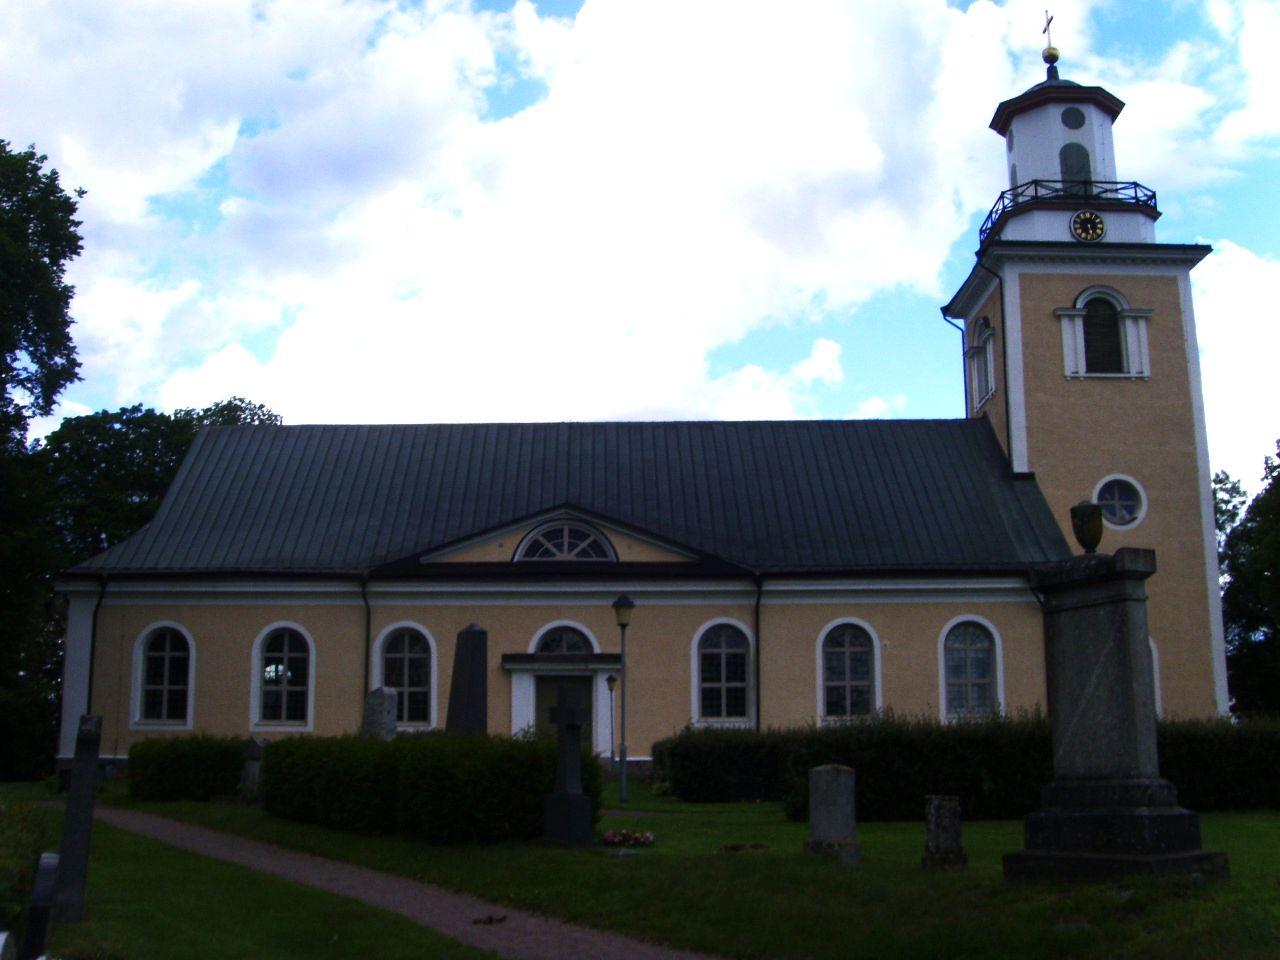 Fil:Mrlunda kyrka garagesale24.net Wikipedia